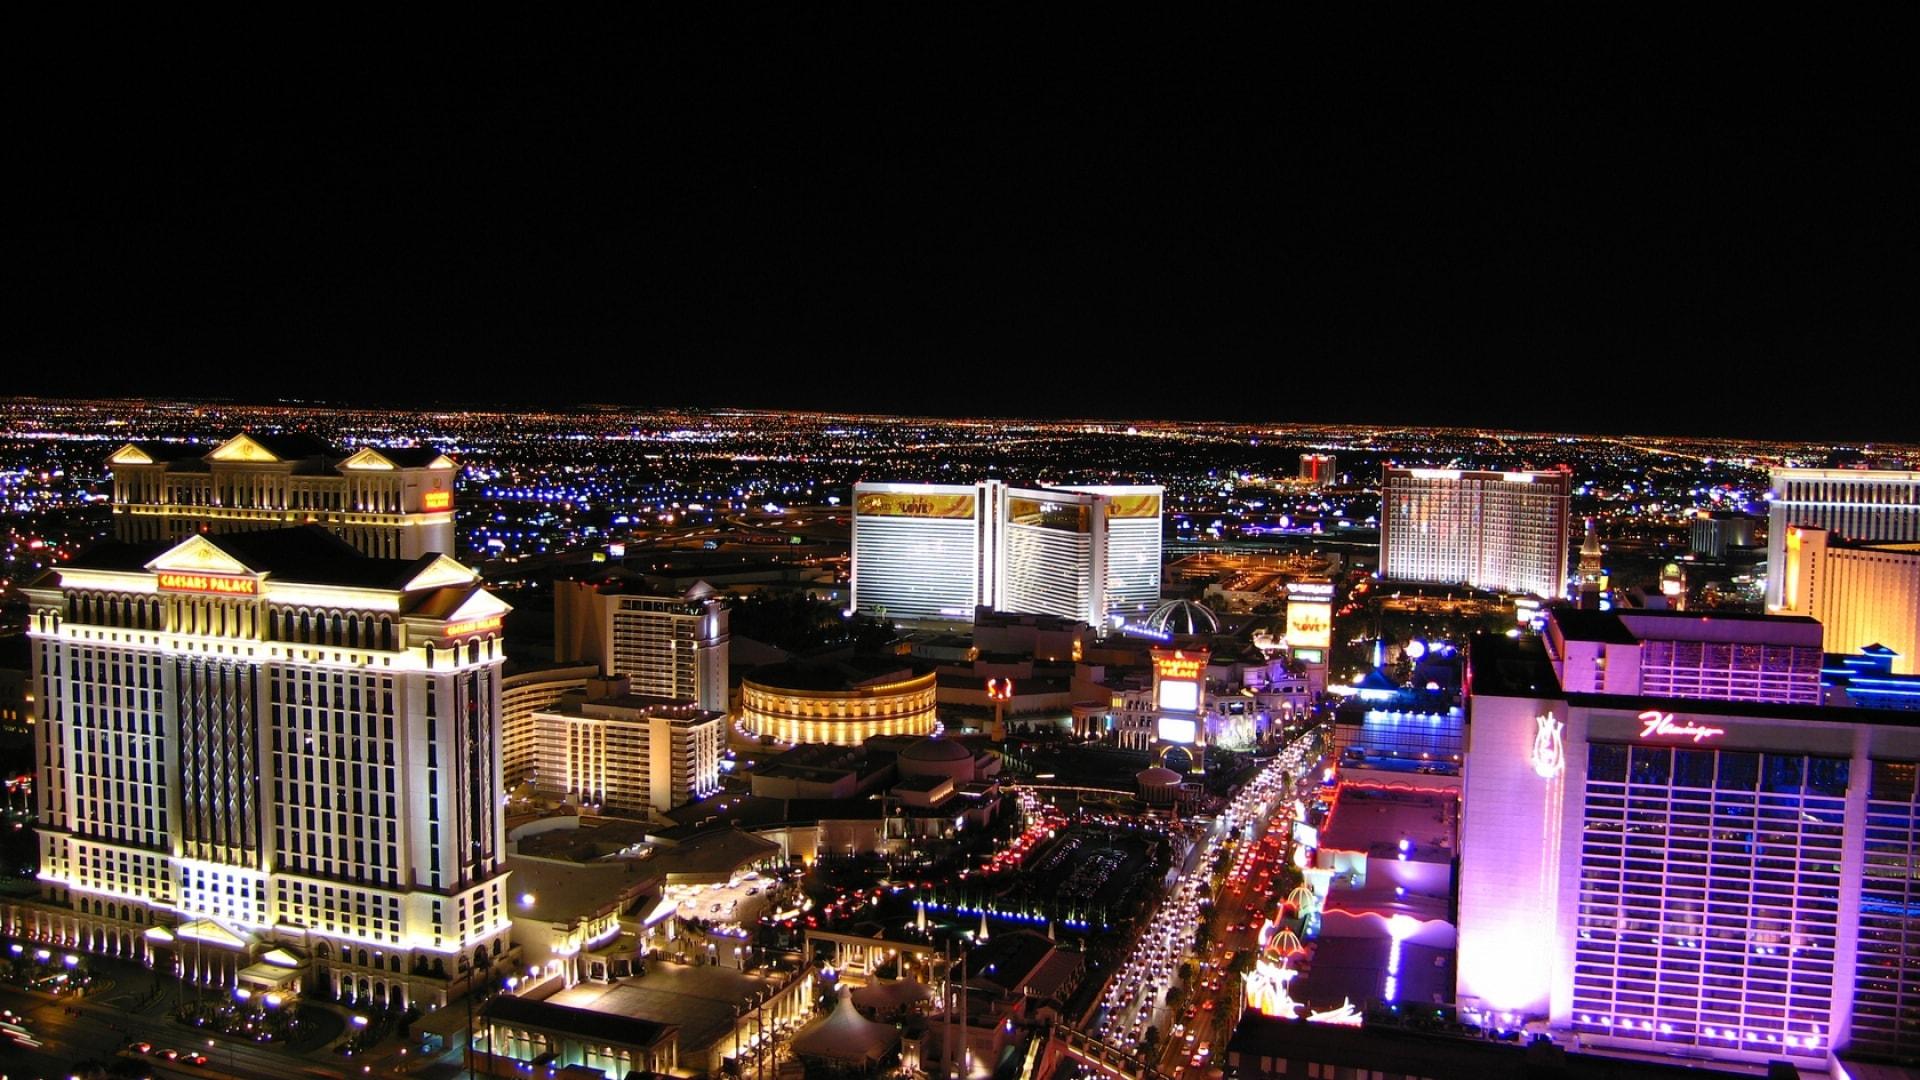 Las Vegas widescreen wallpapers